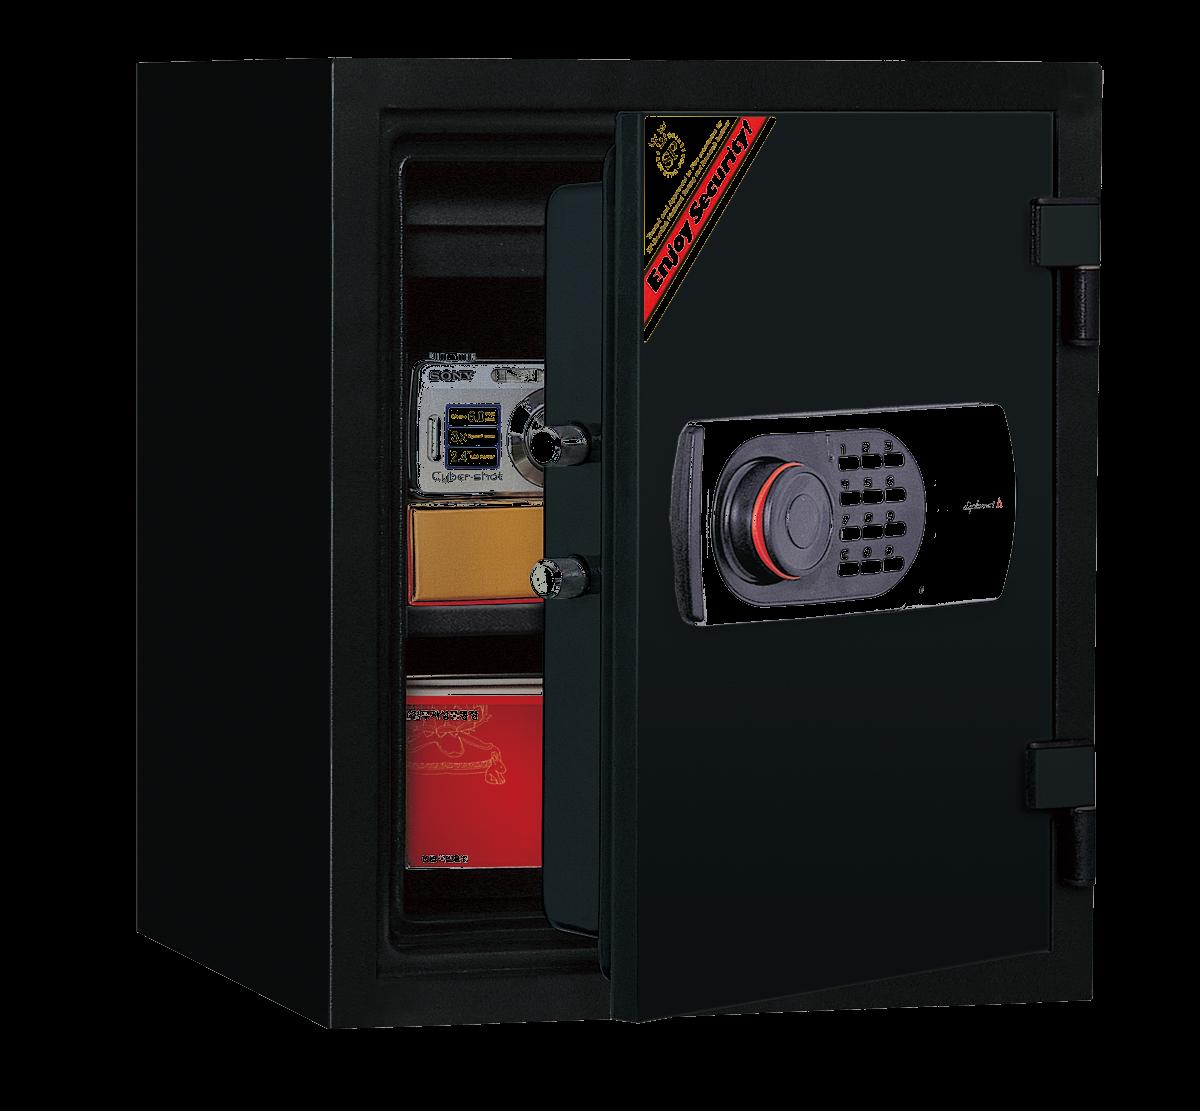 Home Fire Safe, model 125